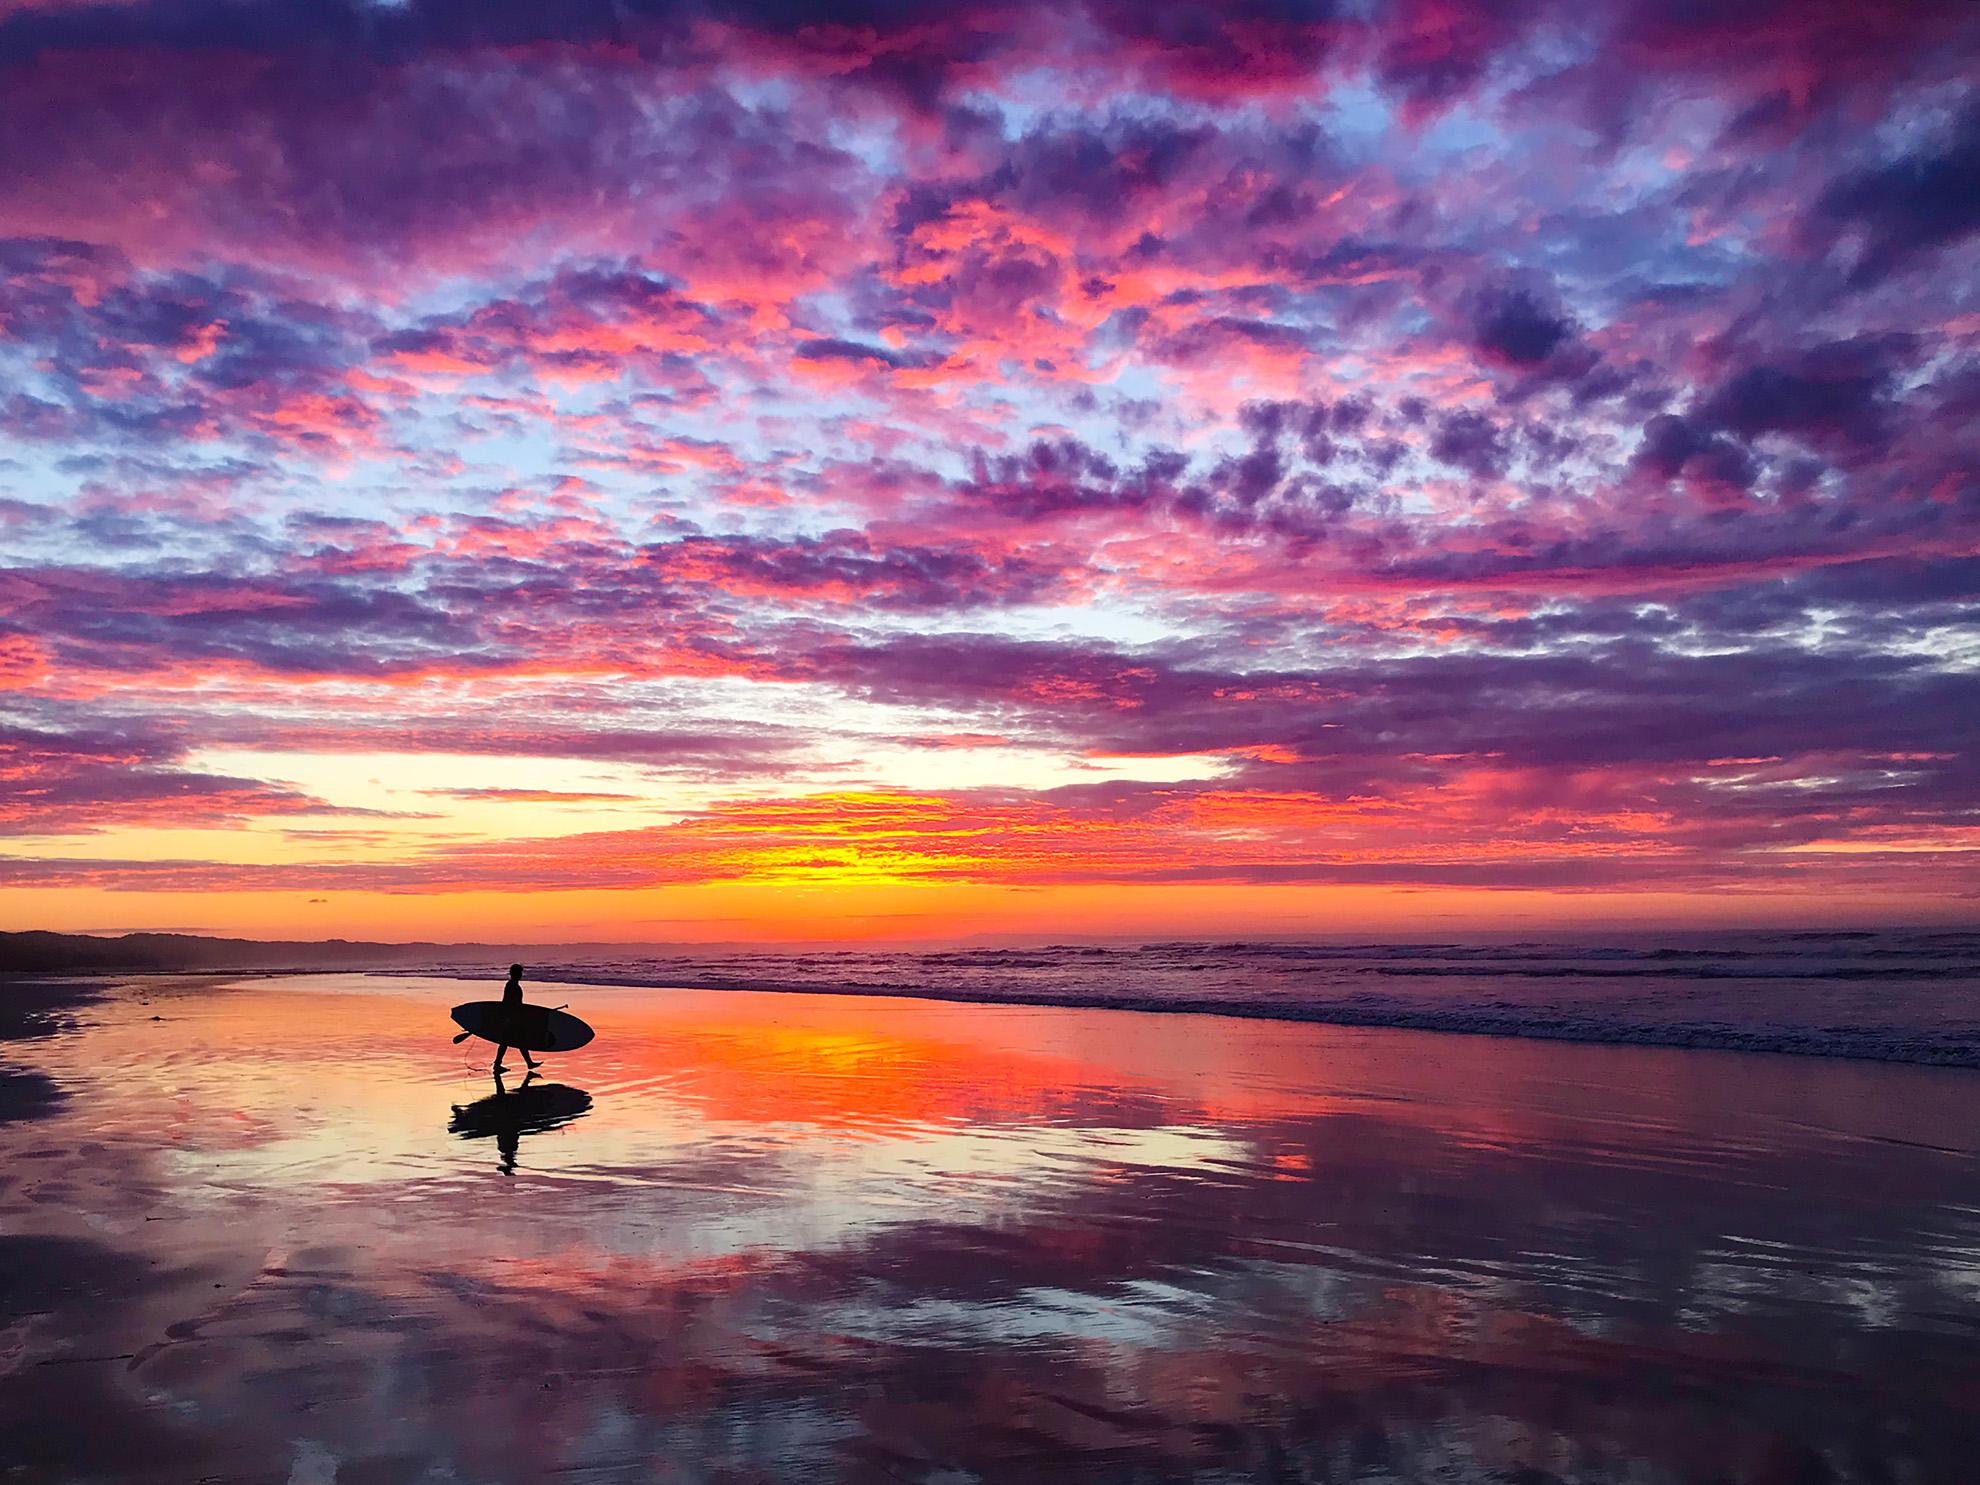 Surfer Reflection